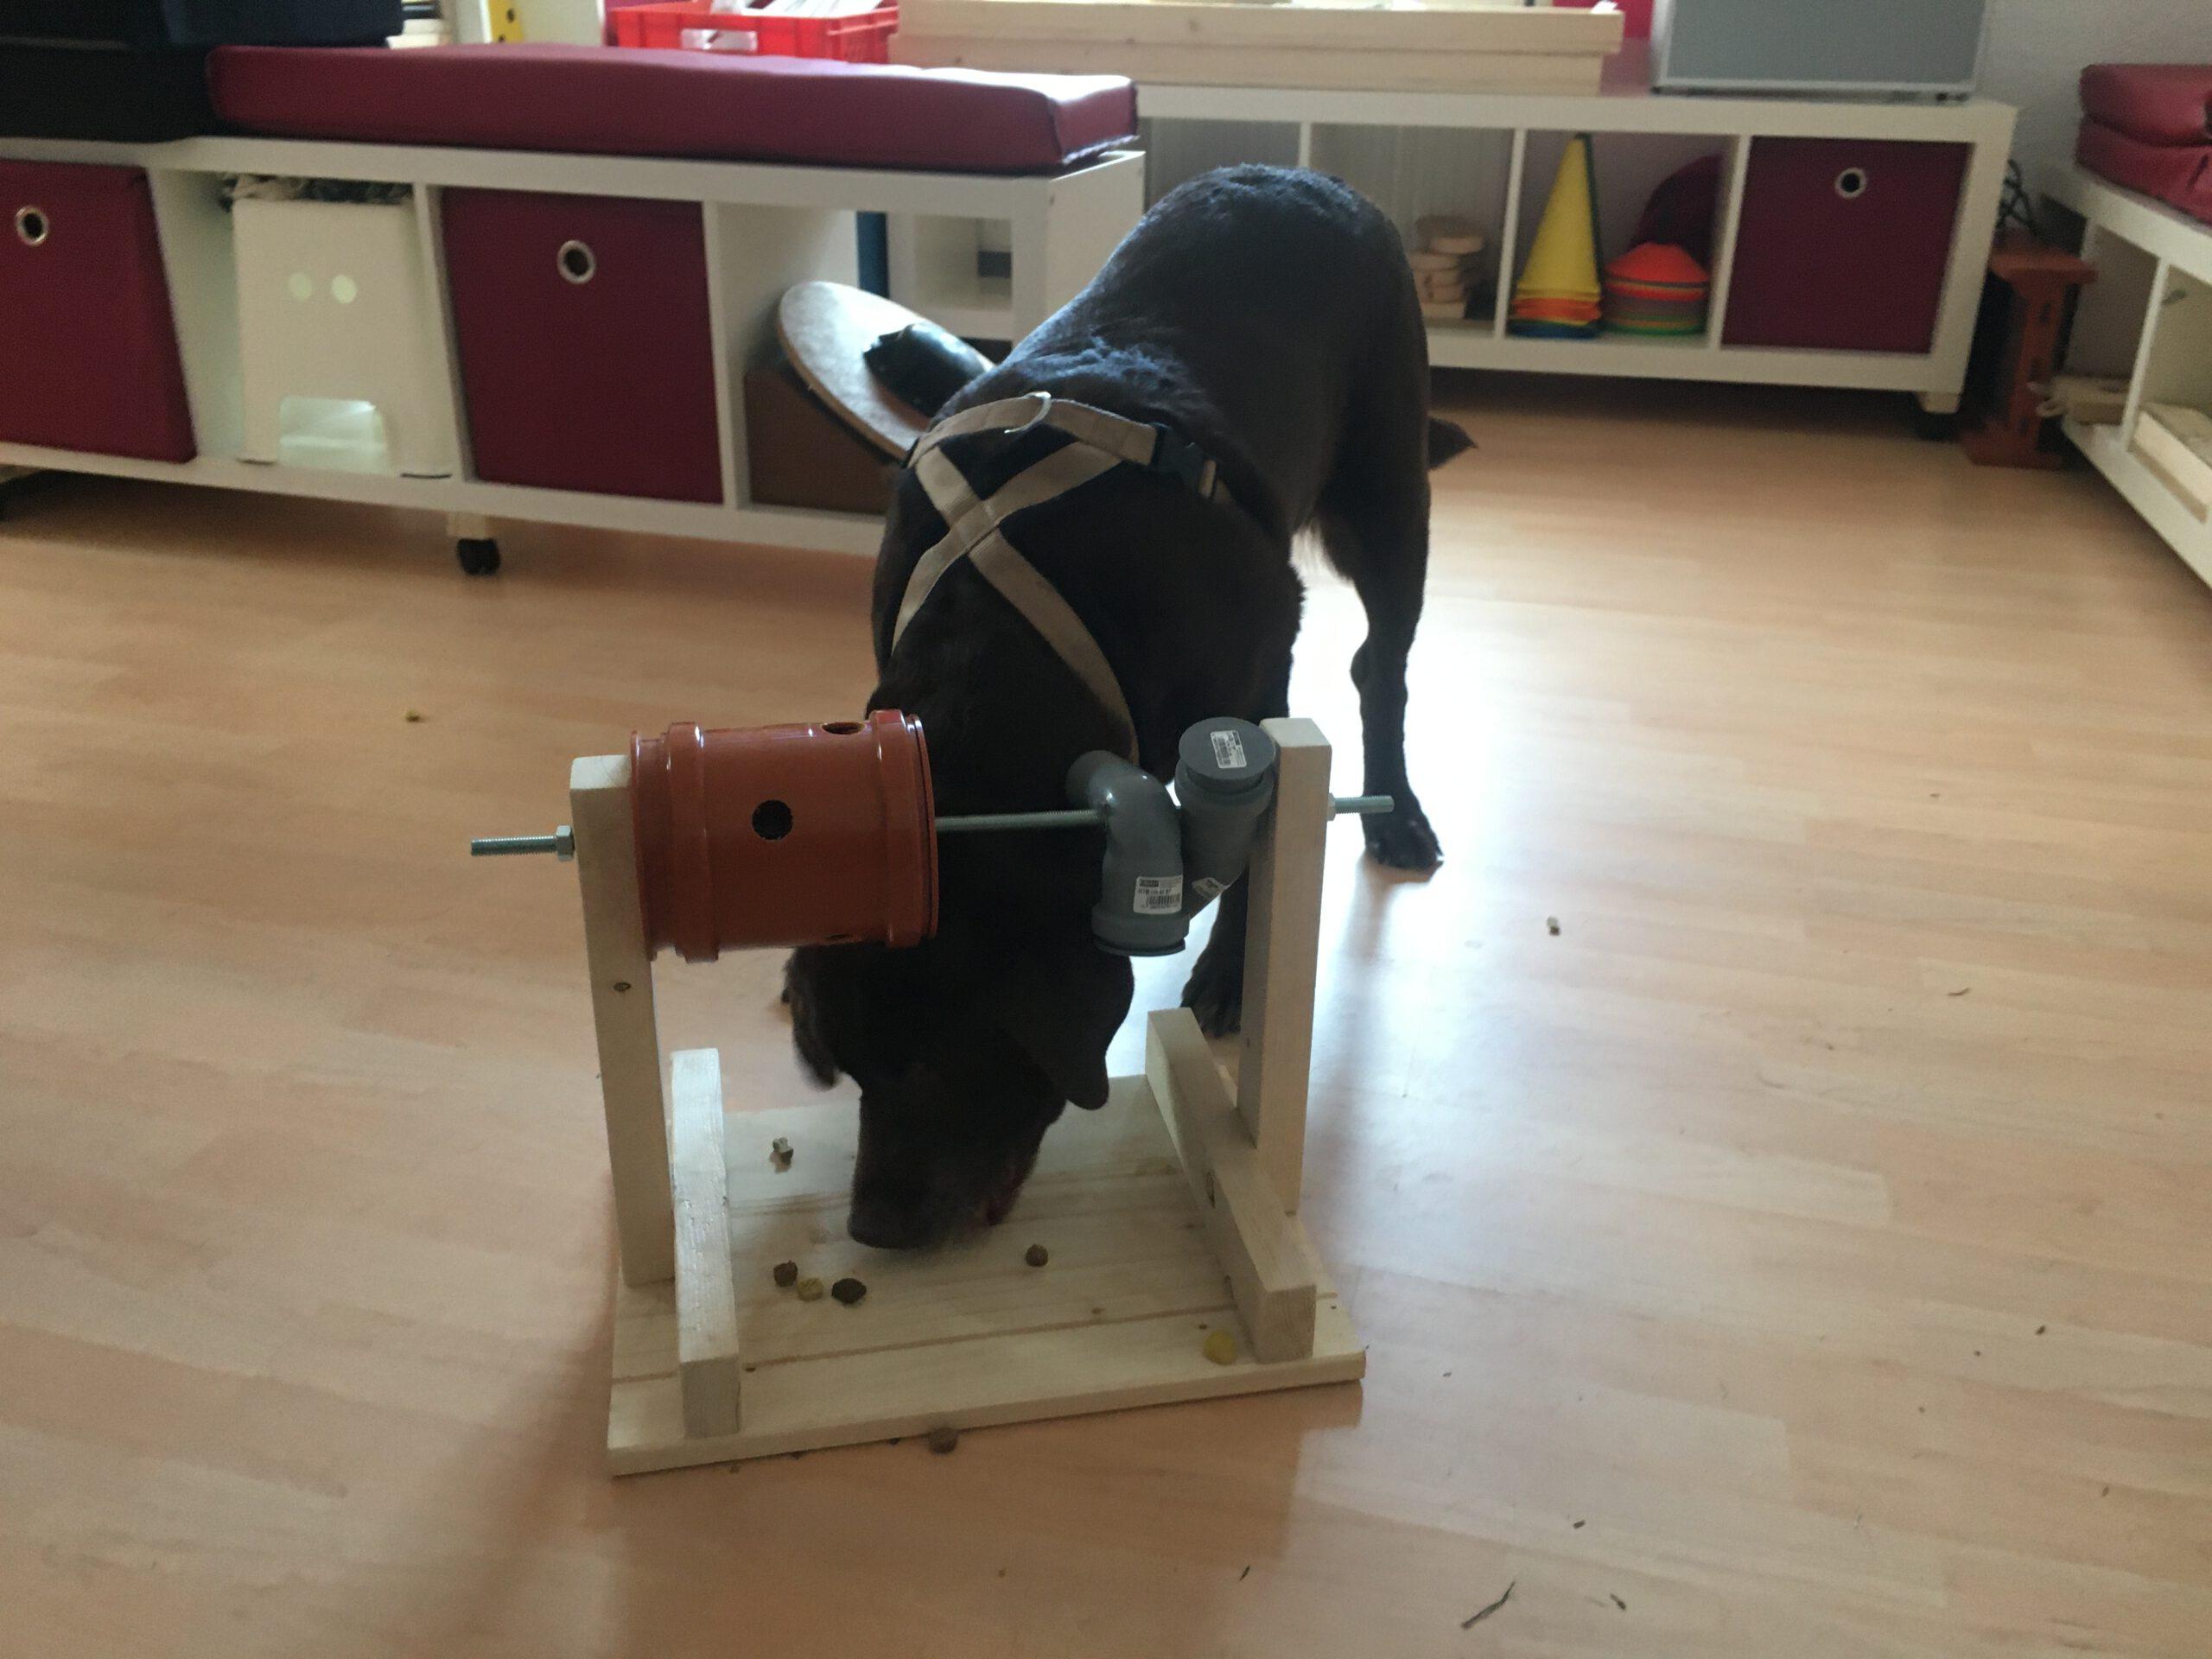 Hund Denkspiel selber bauen Beschäftigung Hundeschule Wilsdruff Zauberhunde 3